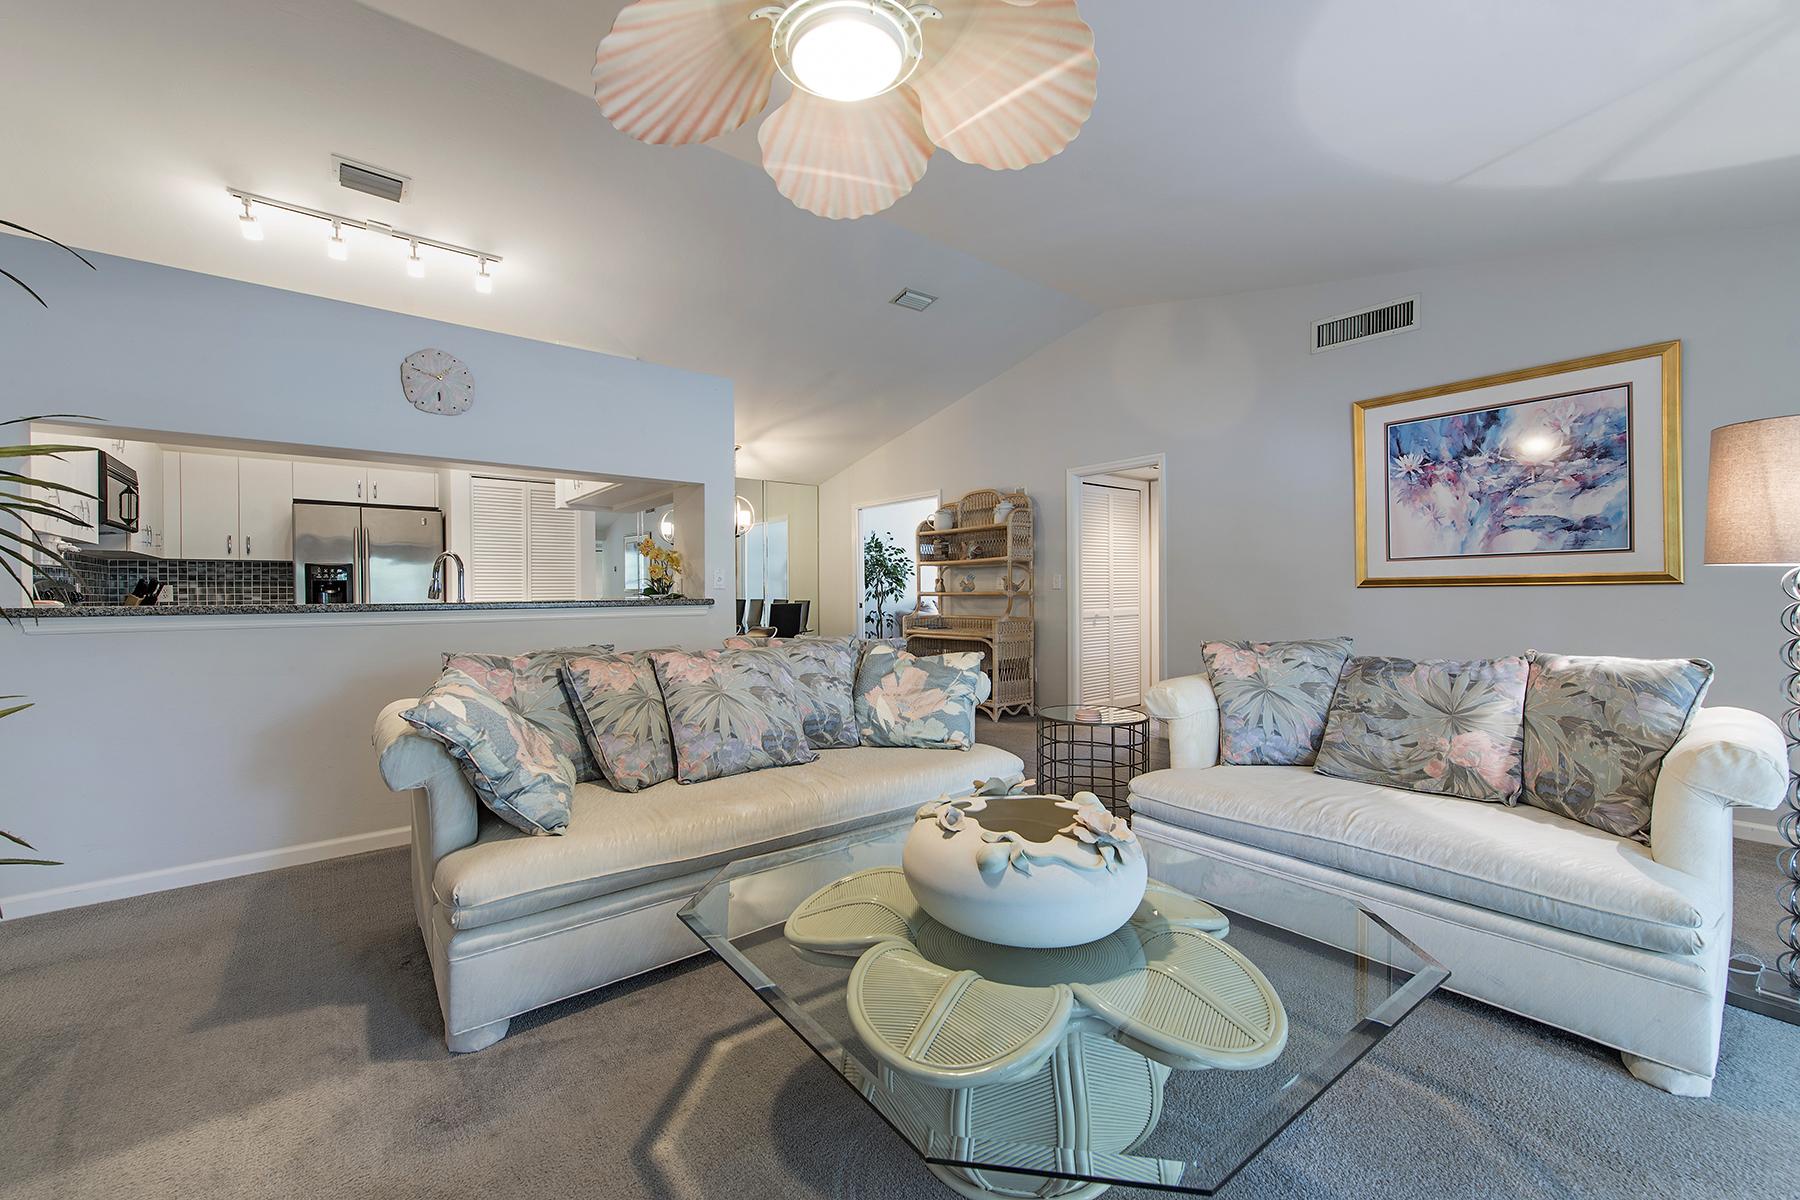 Condominium for Sale at BONITA BAY - SANDPIPER 4211 Lake Forest Dr 724 Bonita Springs, Florida, 34134 United States